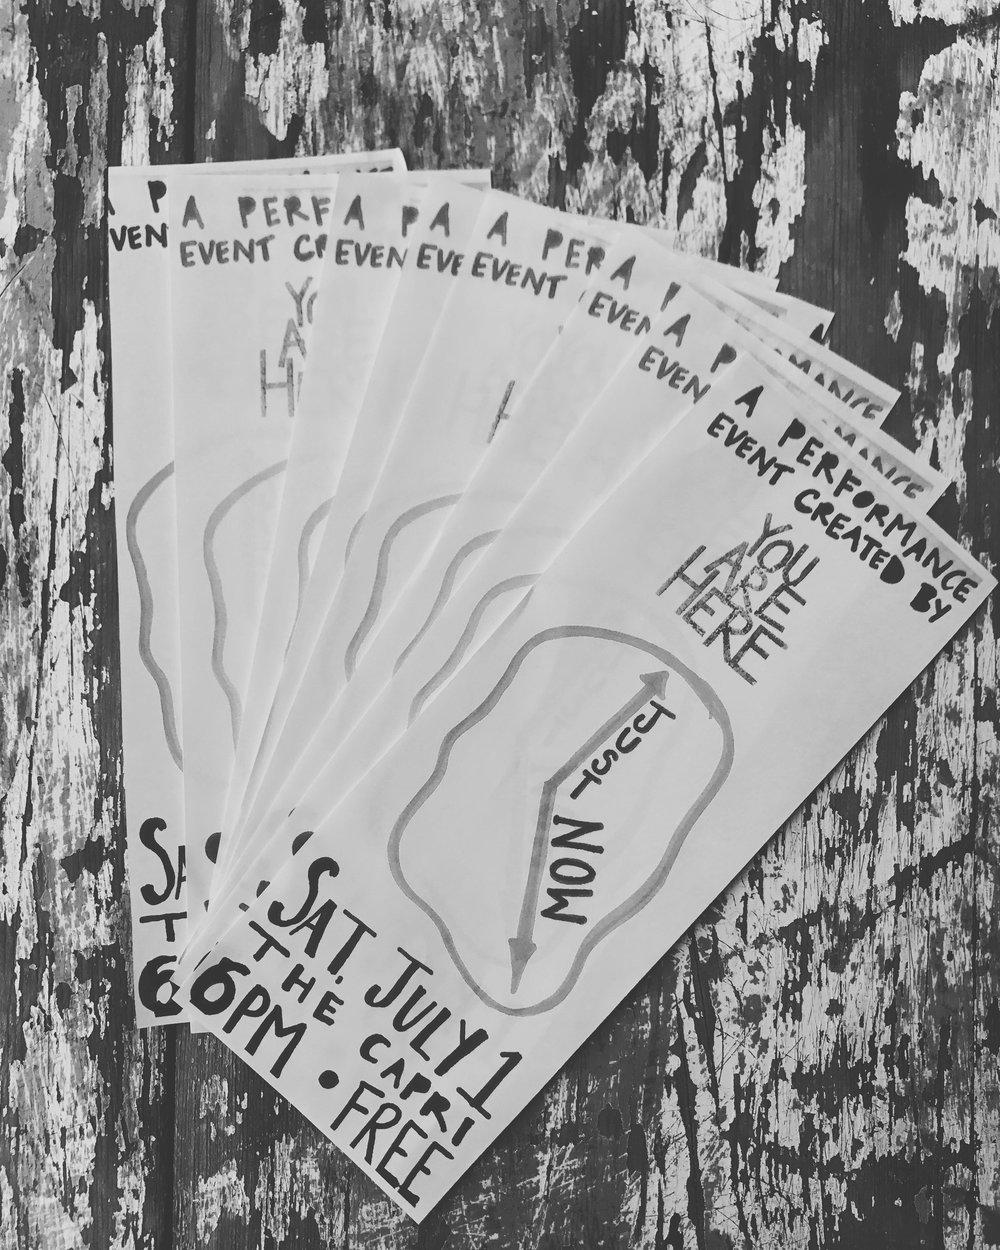 RESIDENCY in Marfa, TX - With generous support from Ballroom Marfa + The Capri Marfa